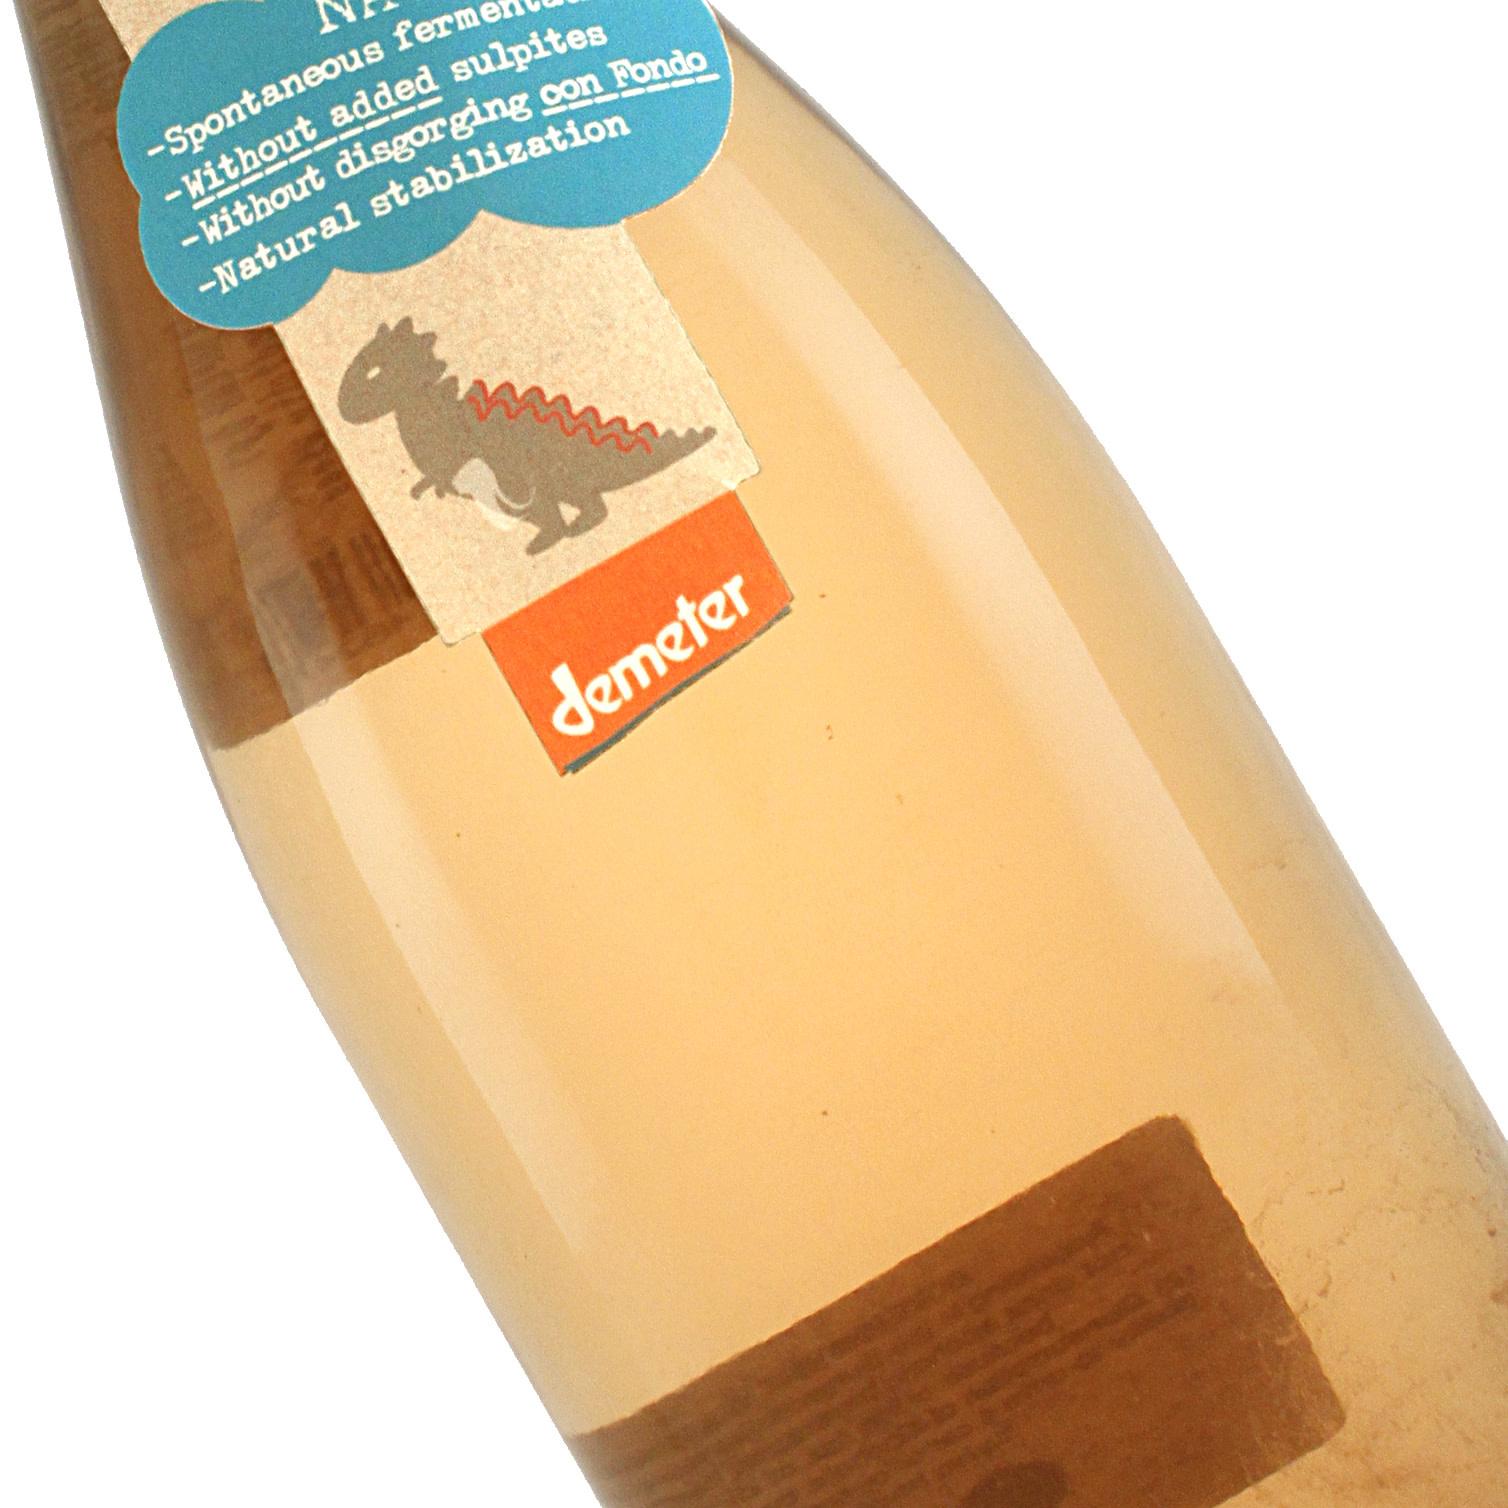 Lunaria 2020 Pinot Grigio Pet-Nat, Biodynamic, Abruzzo Italy